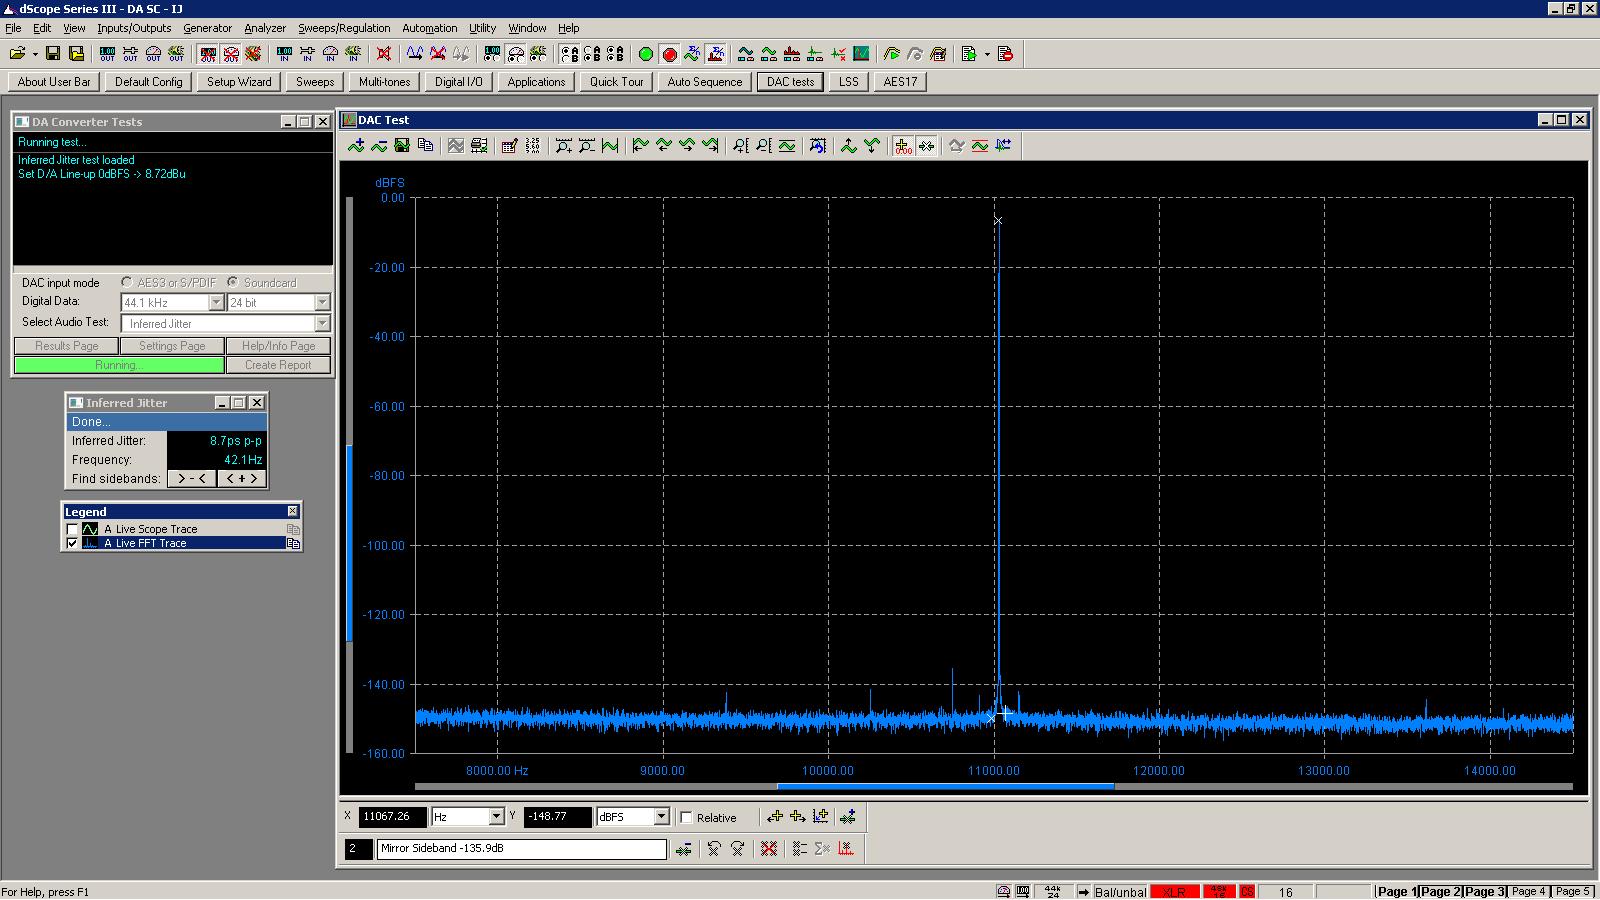 20151120 Bifrost MB SE inferred jitter - USB.PNG